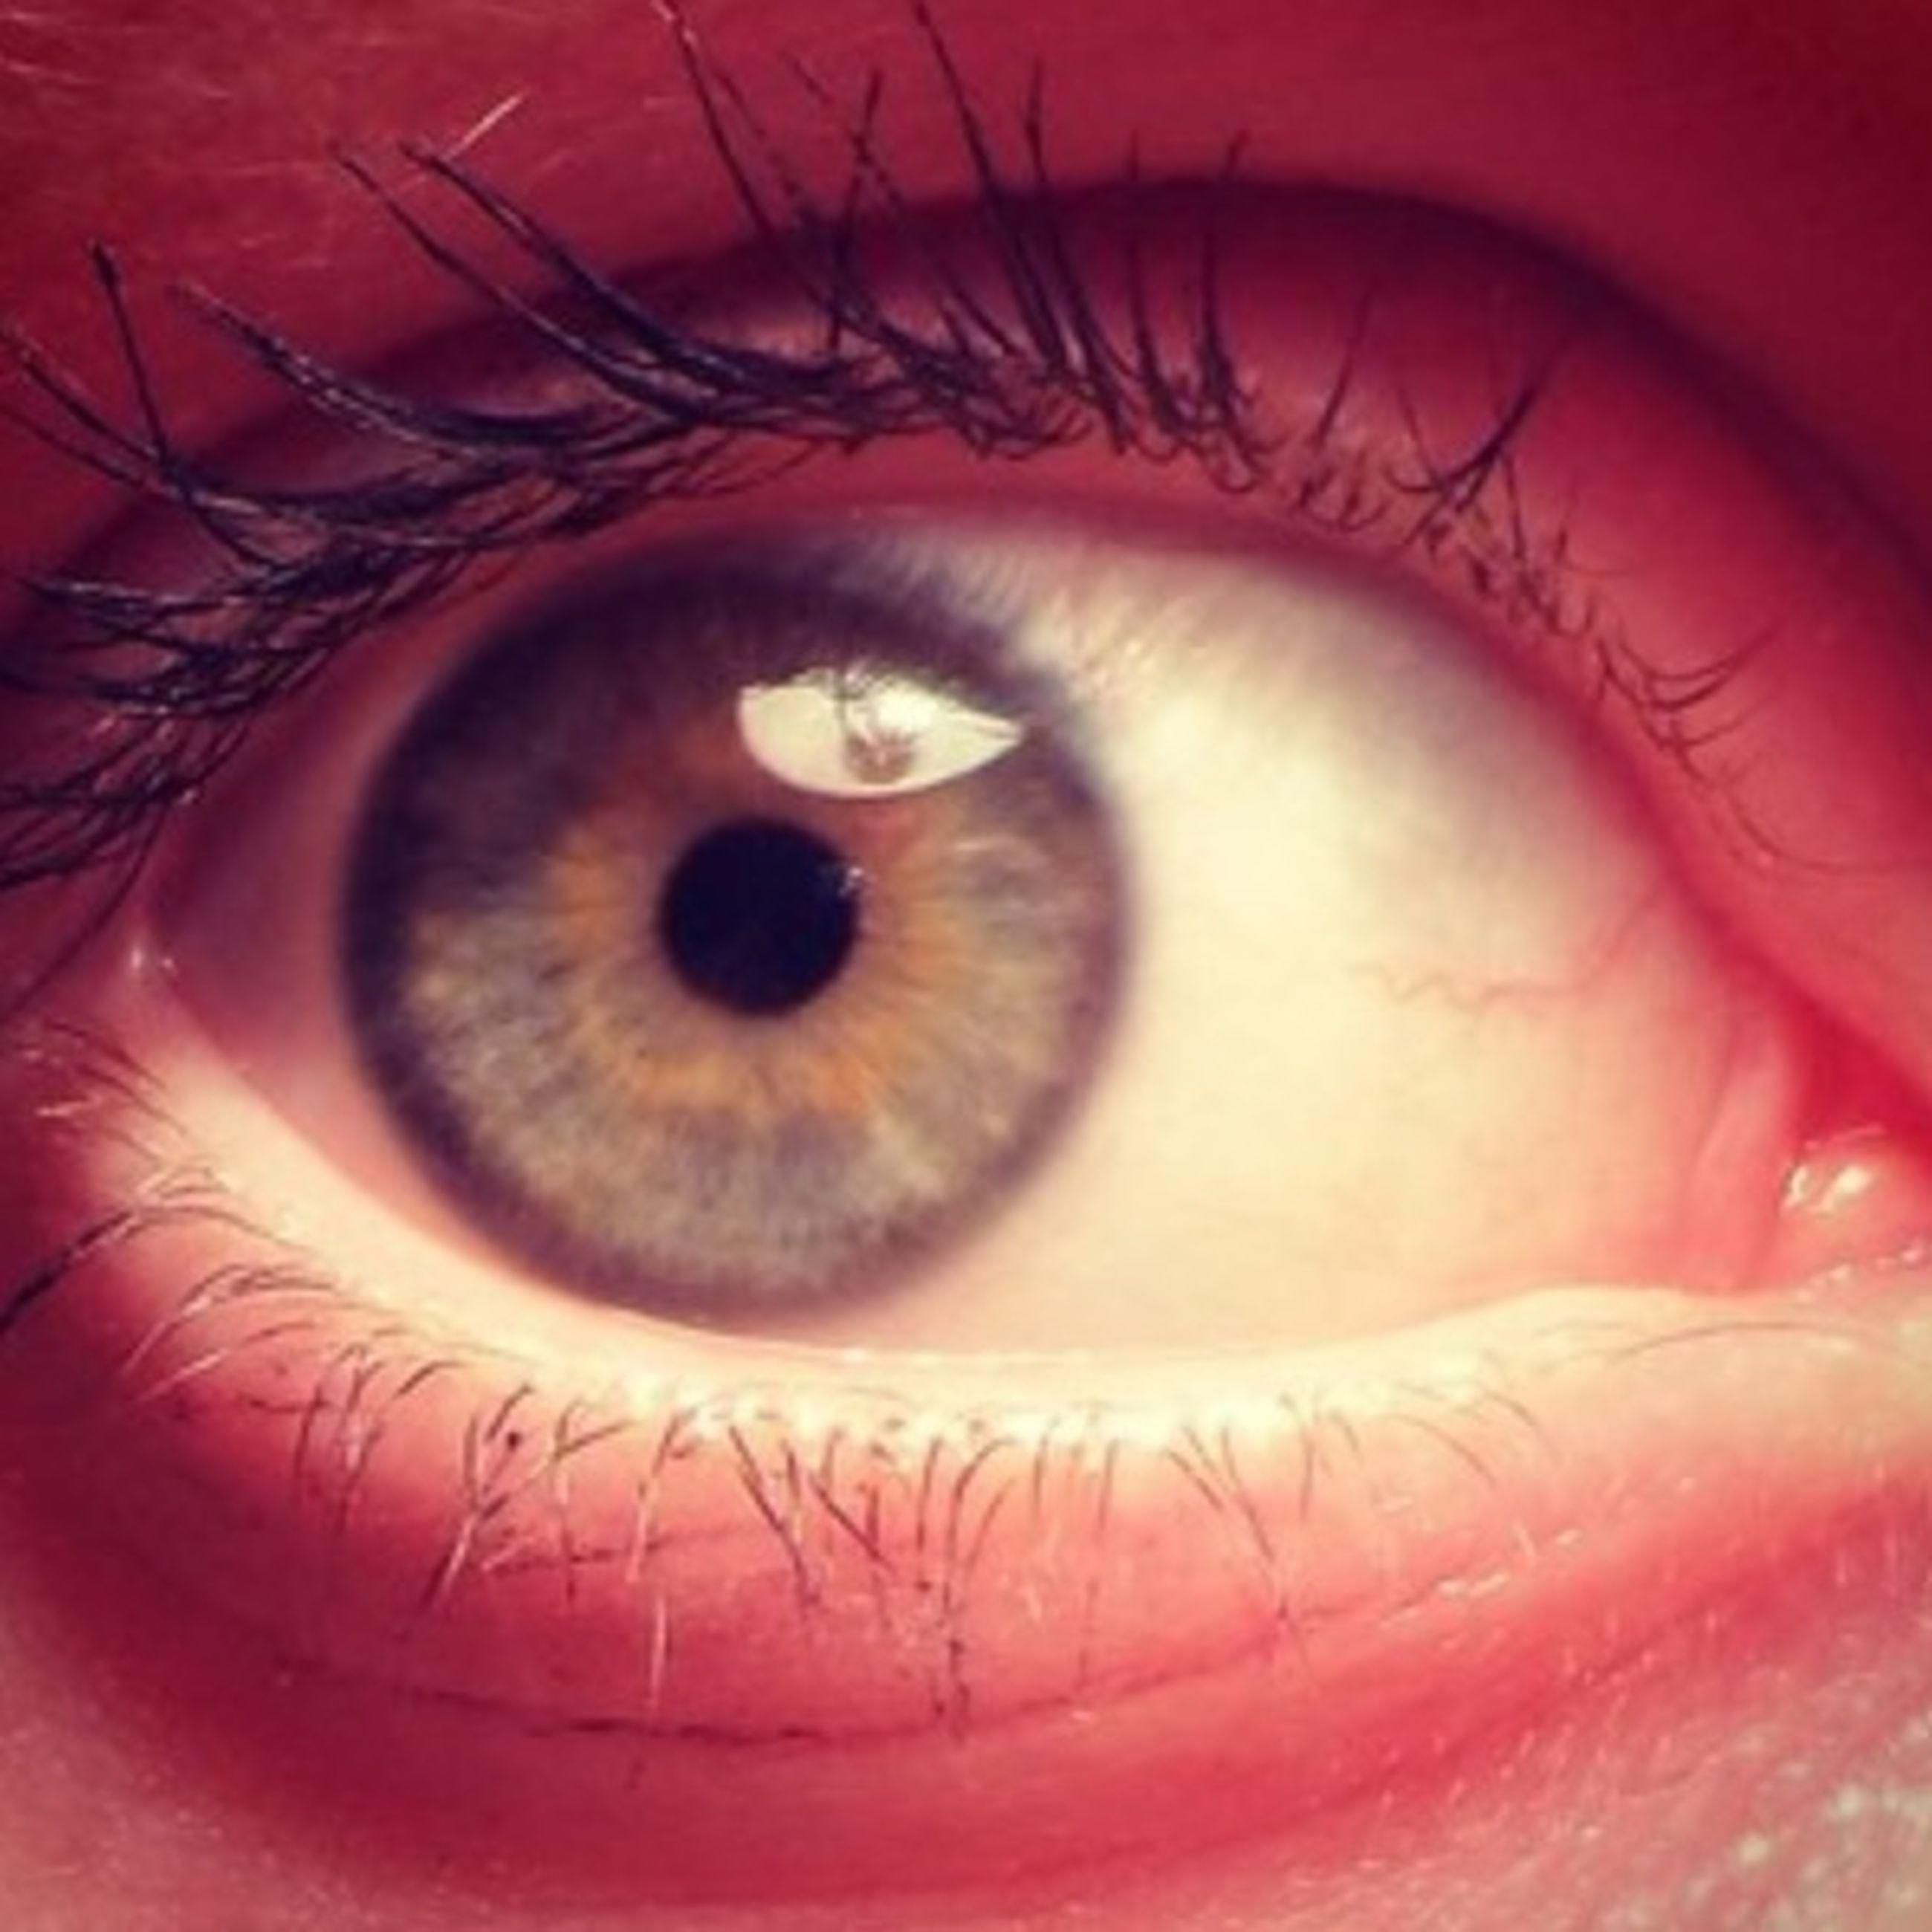 eyelash, human eye, close-up, eyesight, extreme close-up, part of, sensory perception, looking at camera, portrait, indoors, eyeball, iris - eye, red, human skin, human face, extreme close up, person